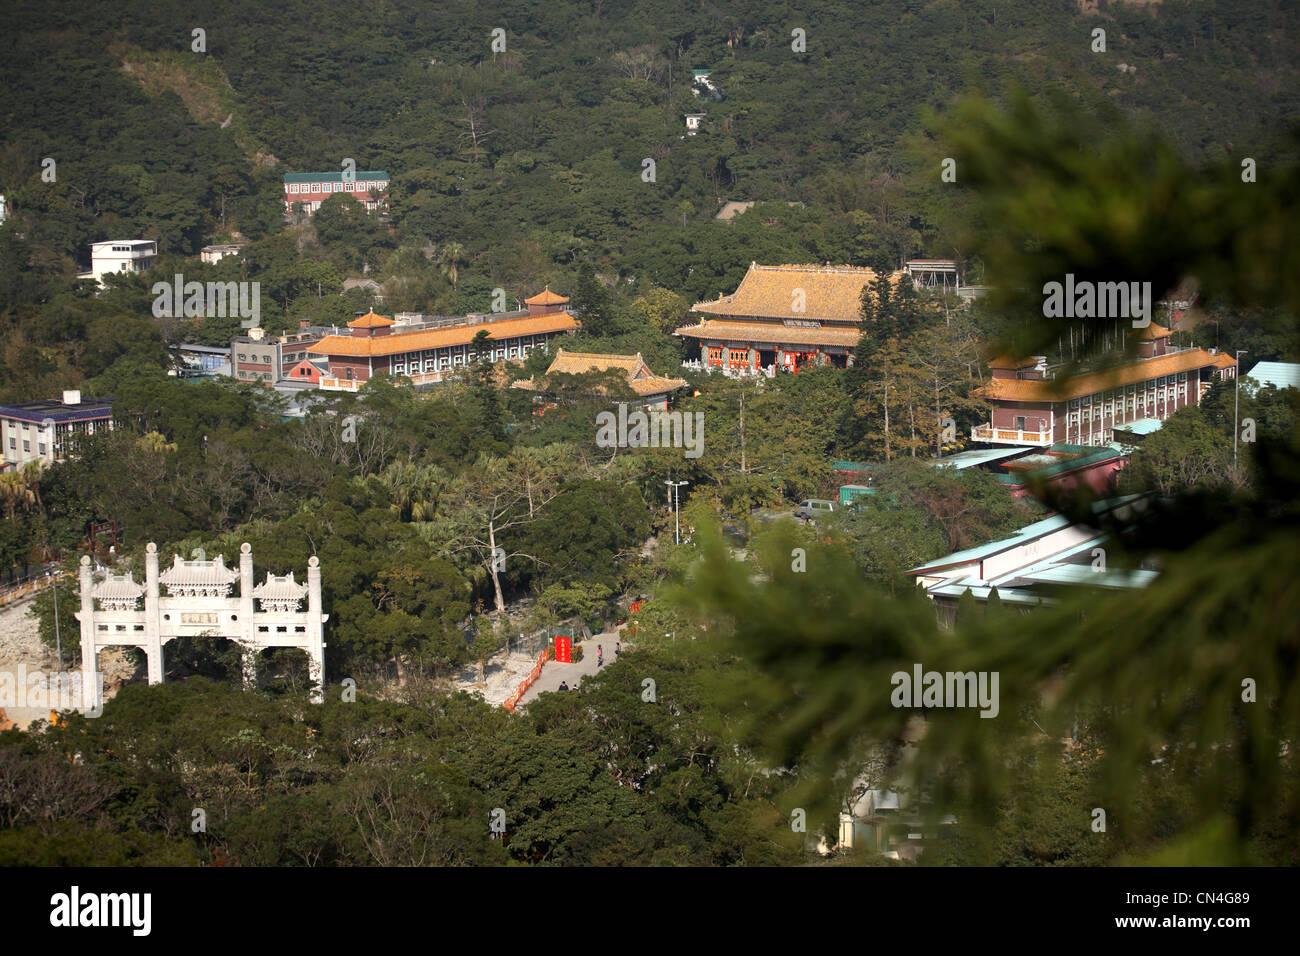 View of Po lIn Monastery from the Big Buddha, Lantau Island, Hong Kong - Stock Image